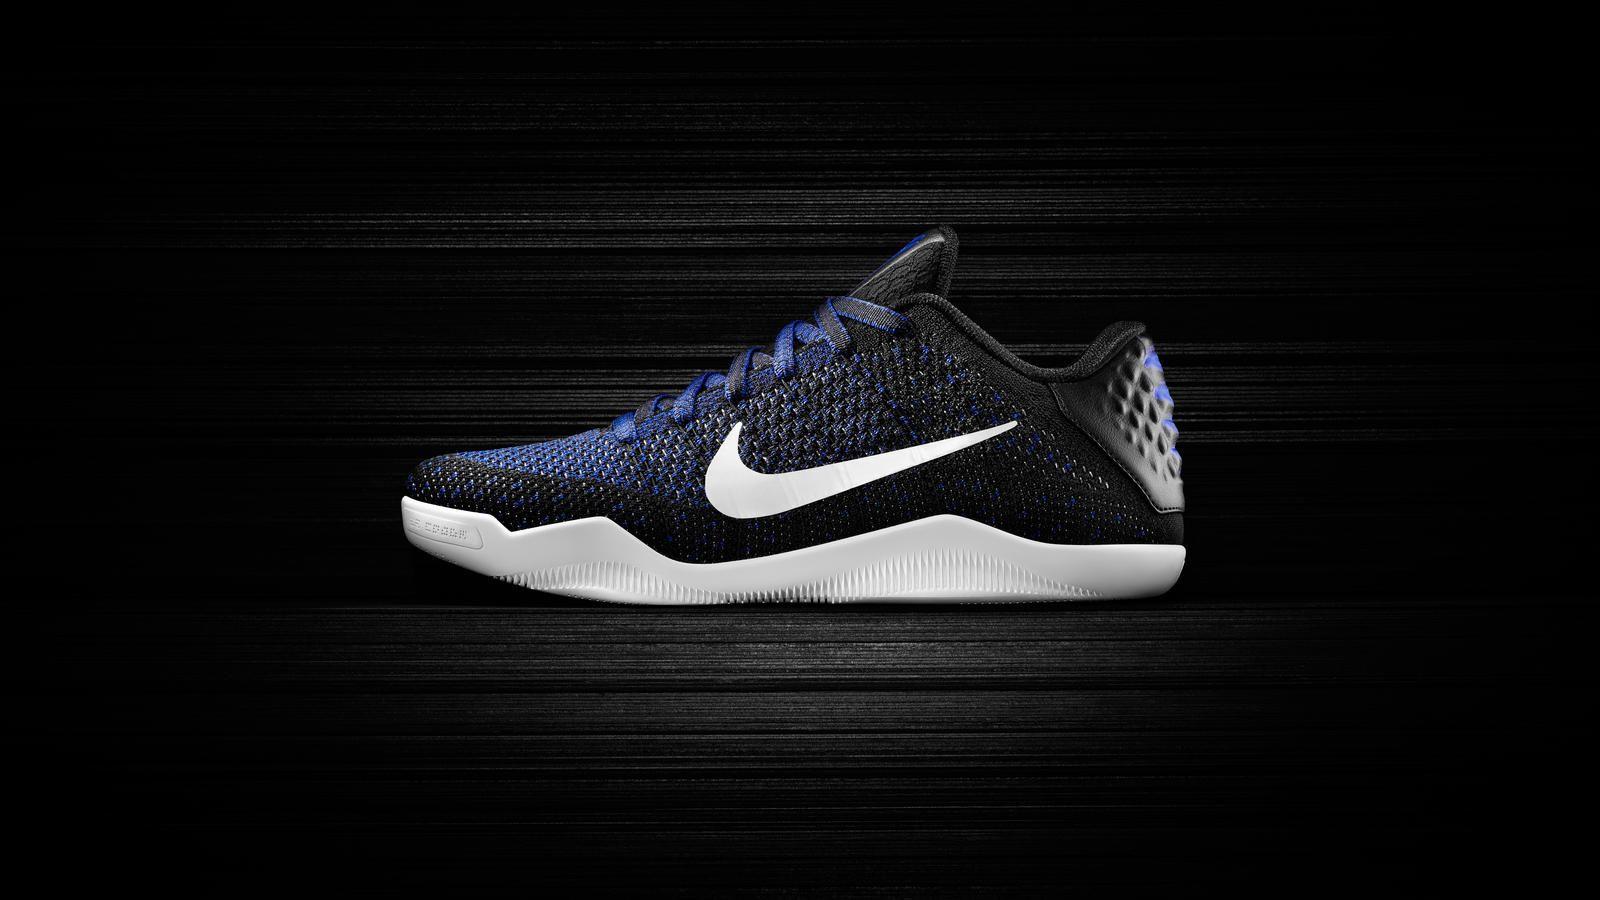 bca9f49e3a85 Nike News - KOBE 11 Muse Pack  Mark Parker Pays Tribute to the Black Mamba